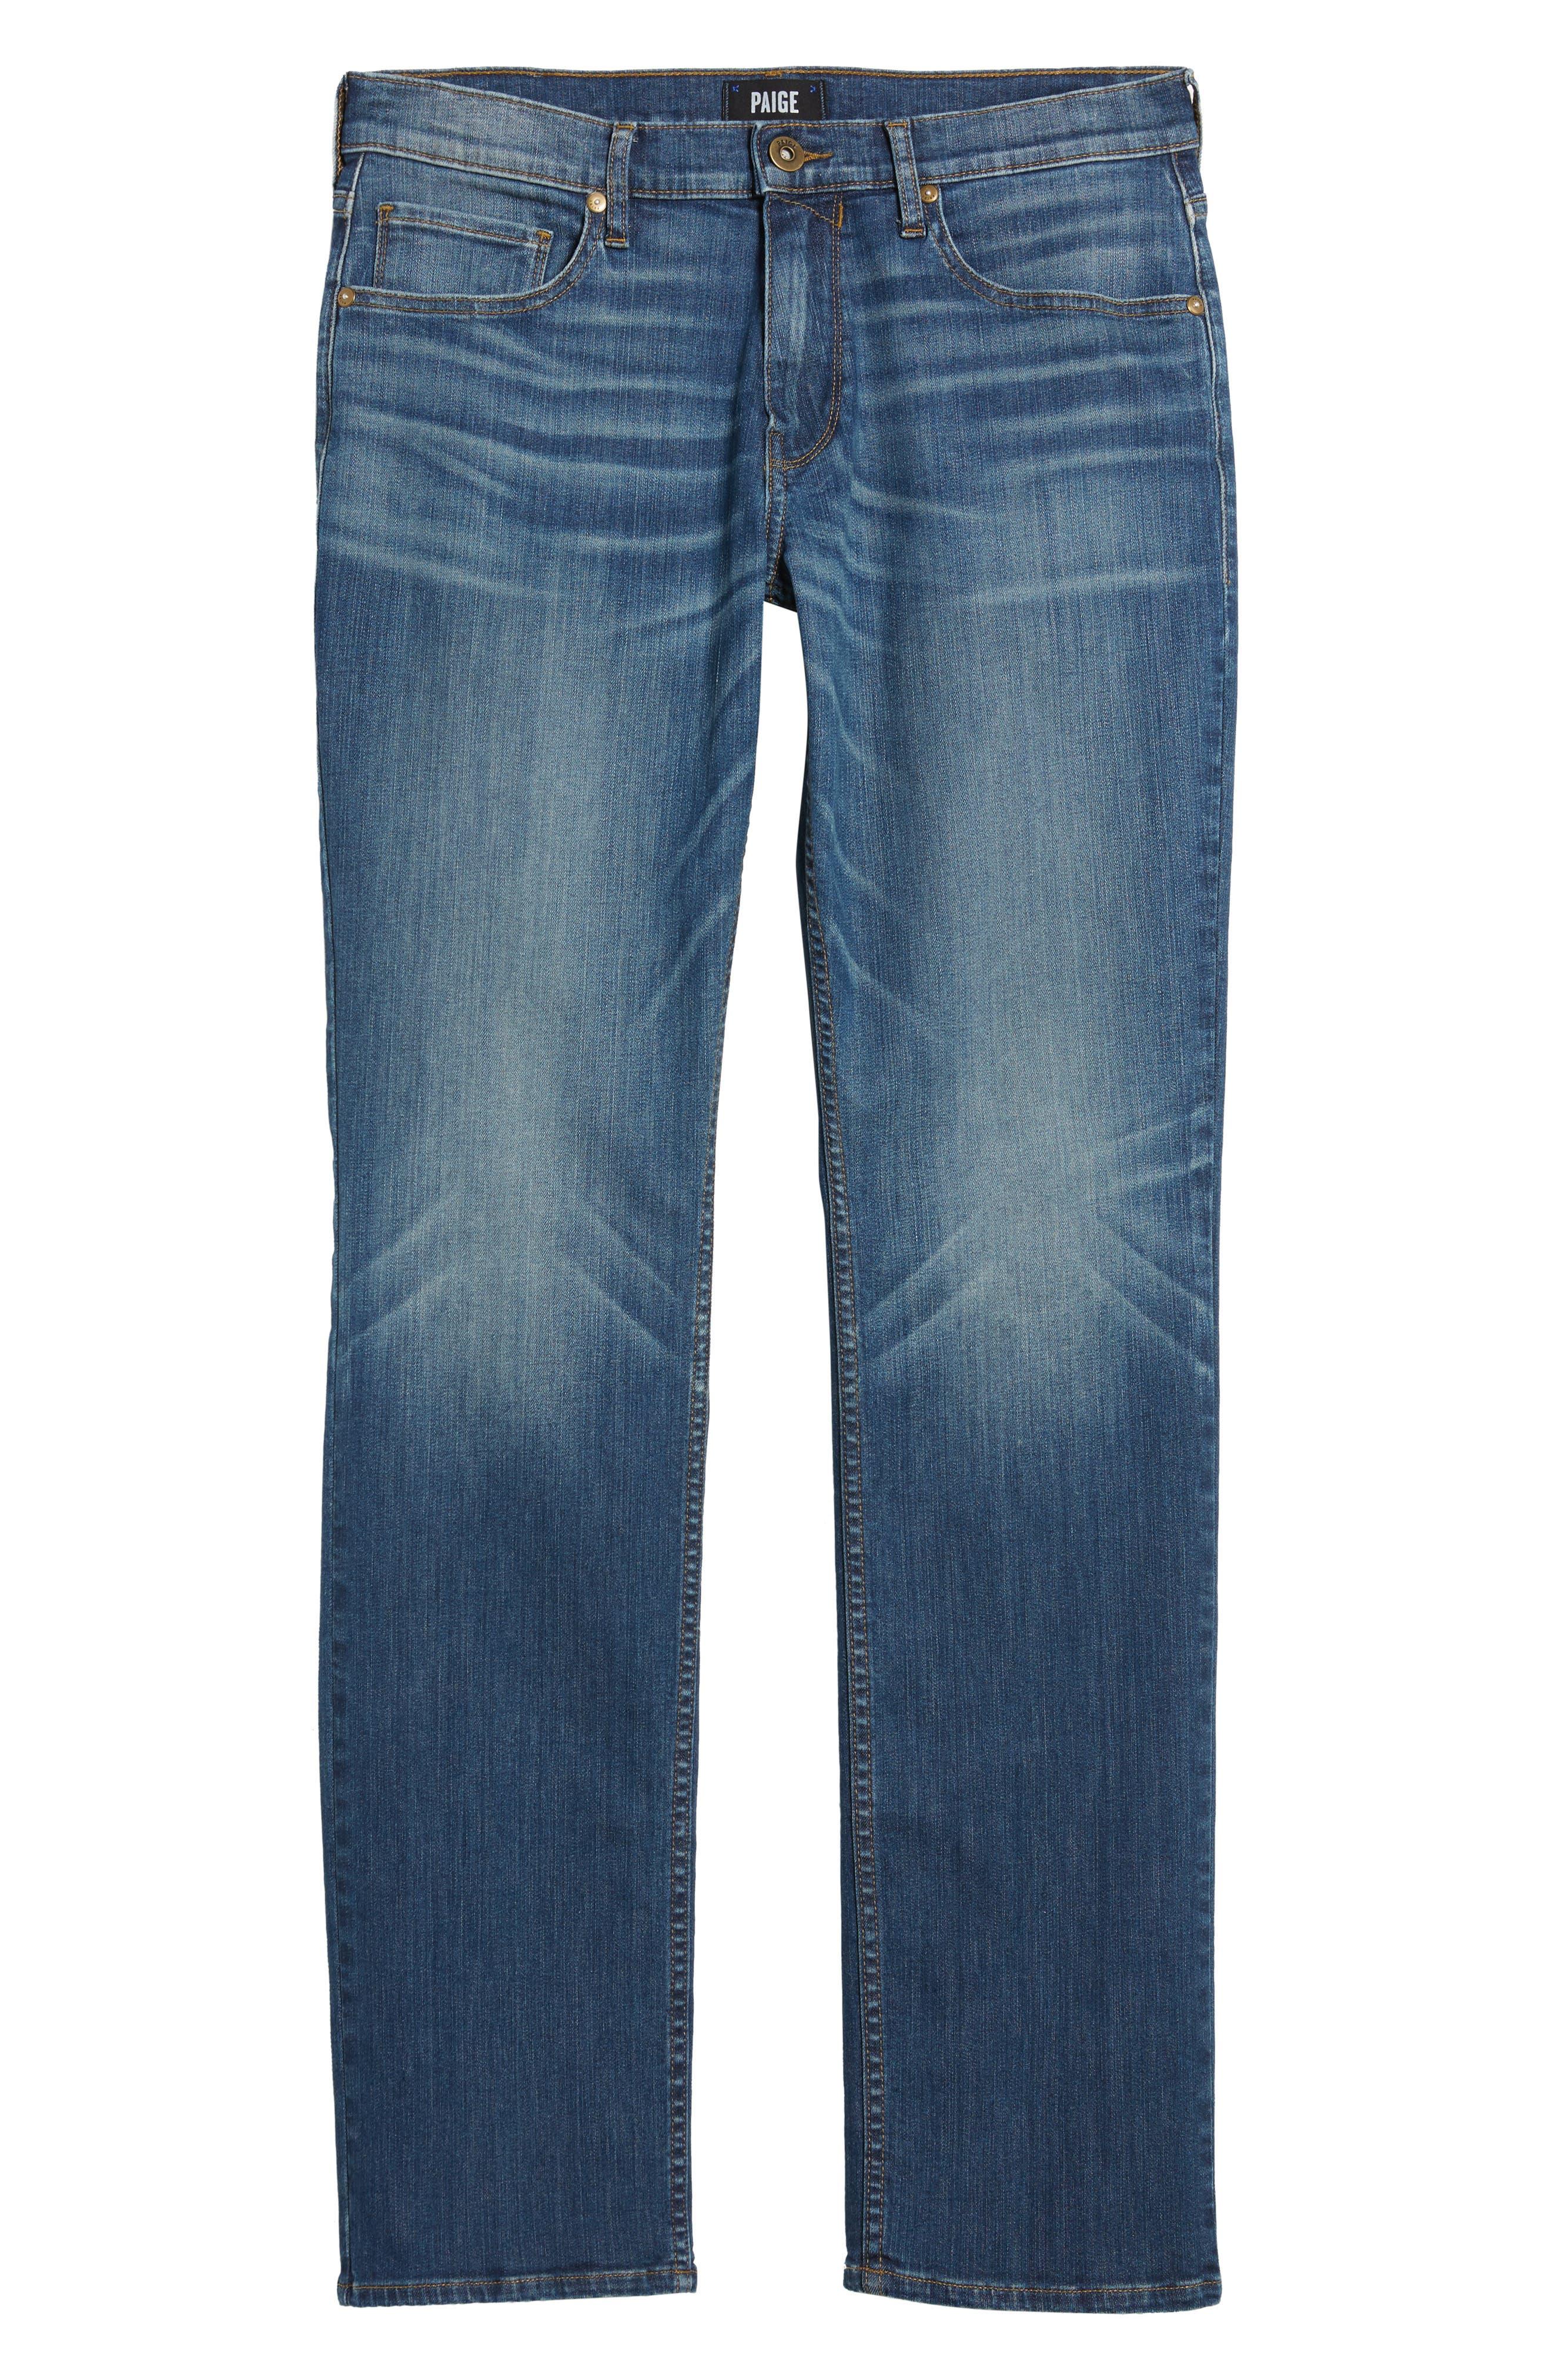 Legacy - Normandie Straight Leg Jeans,                             Alternate thumbnail 6, color,                             Harlan